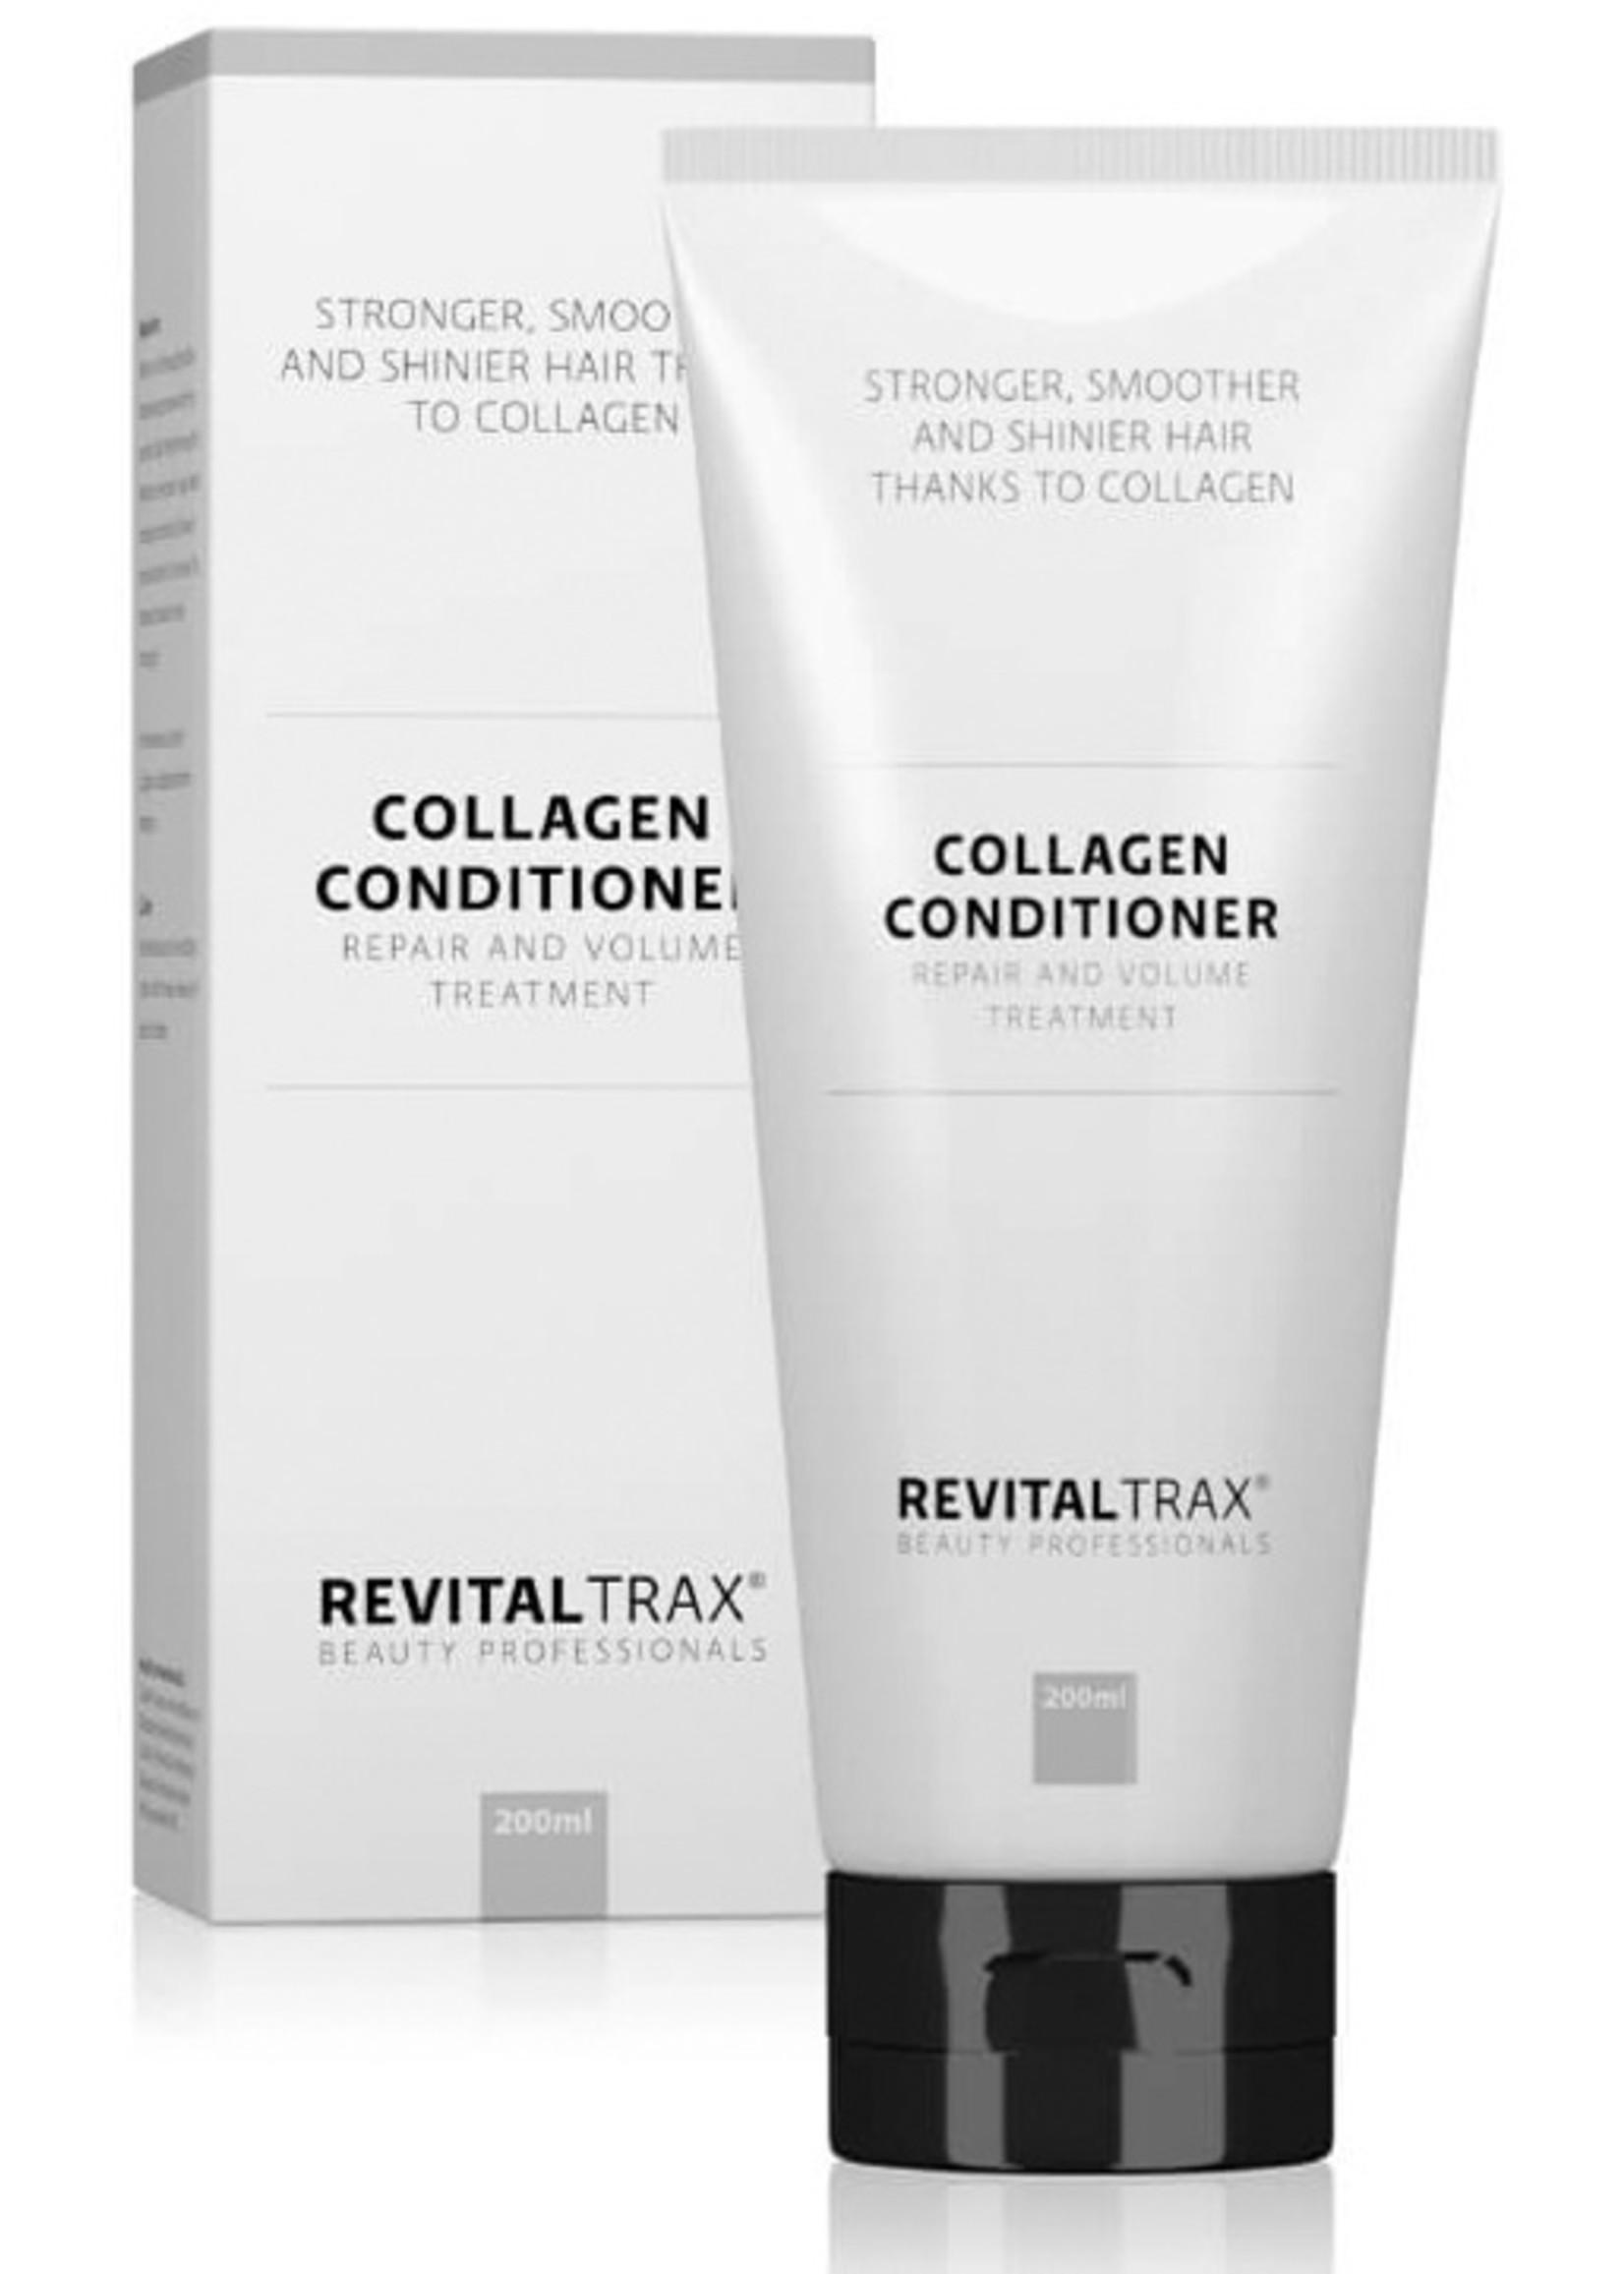 Revitaltrax Collagen Conditioner